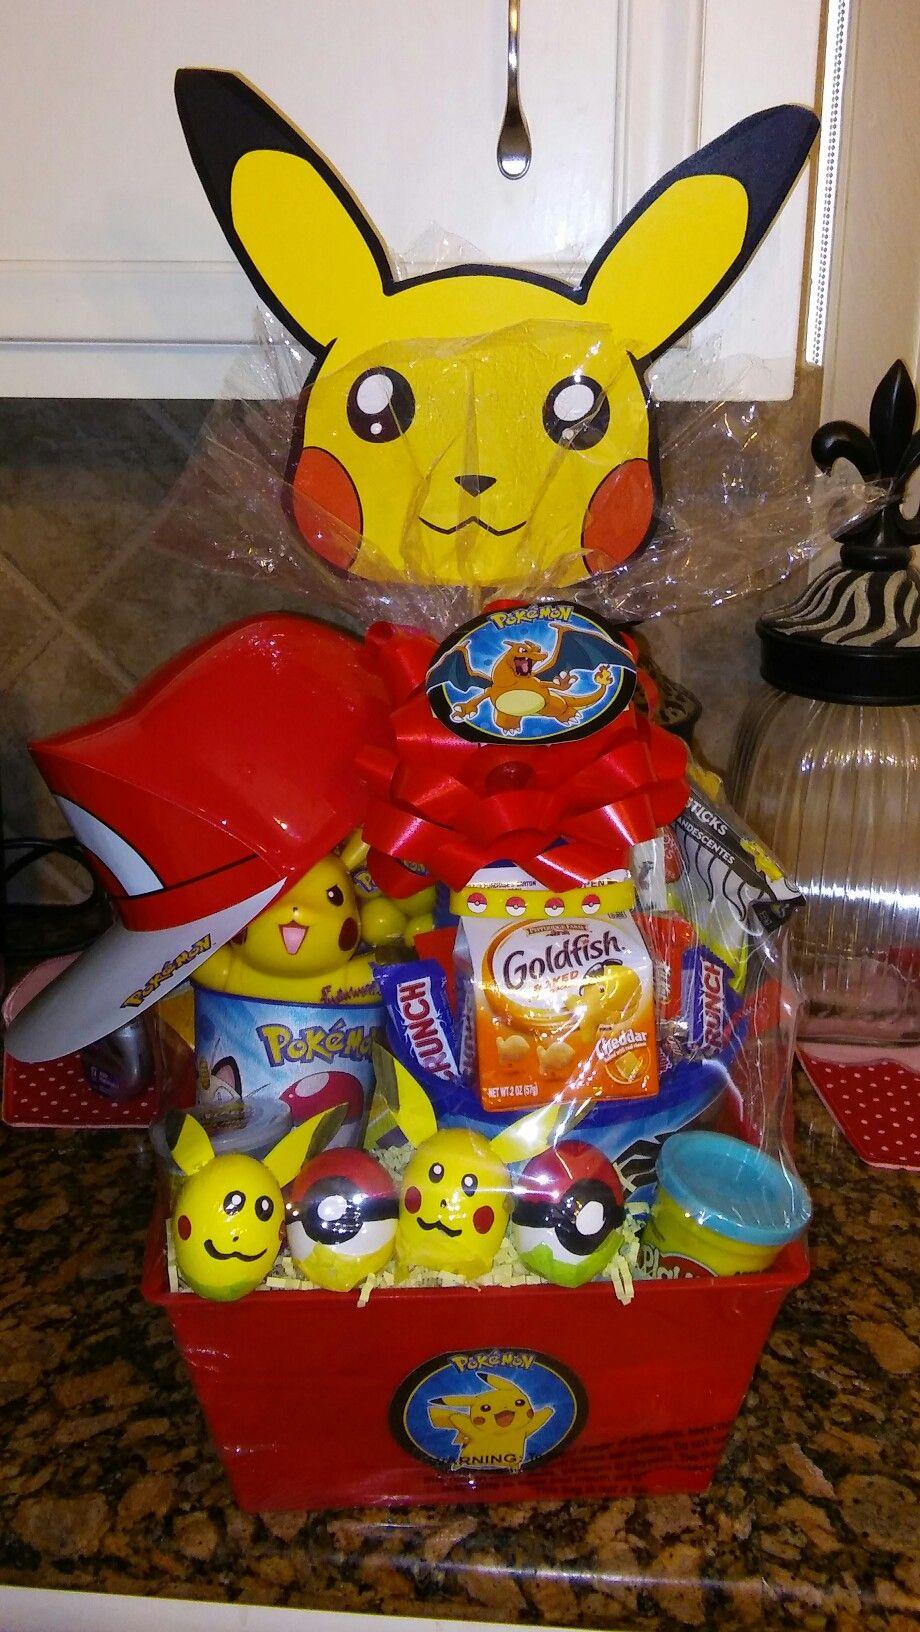 Pokemon gift basket gift baskets pinterest easter pokemon gift basket negle Choice Image